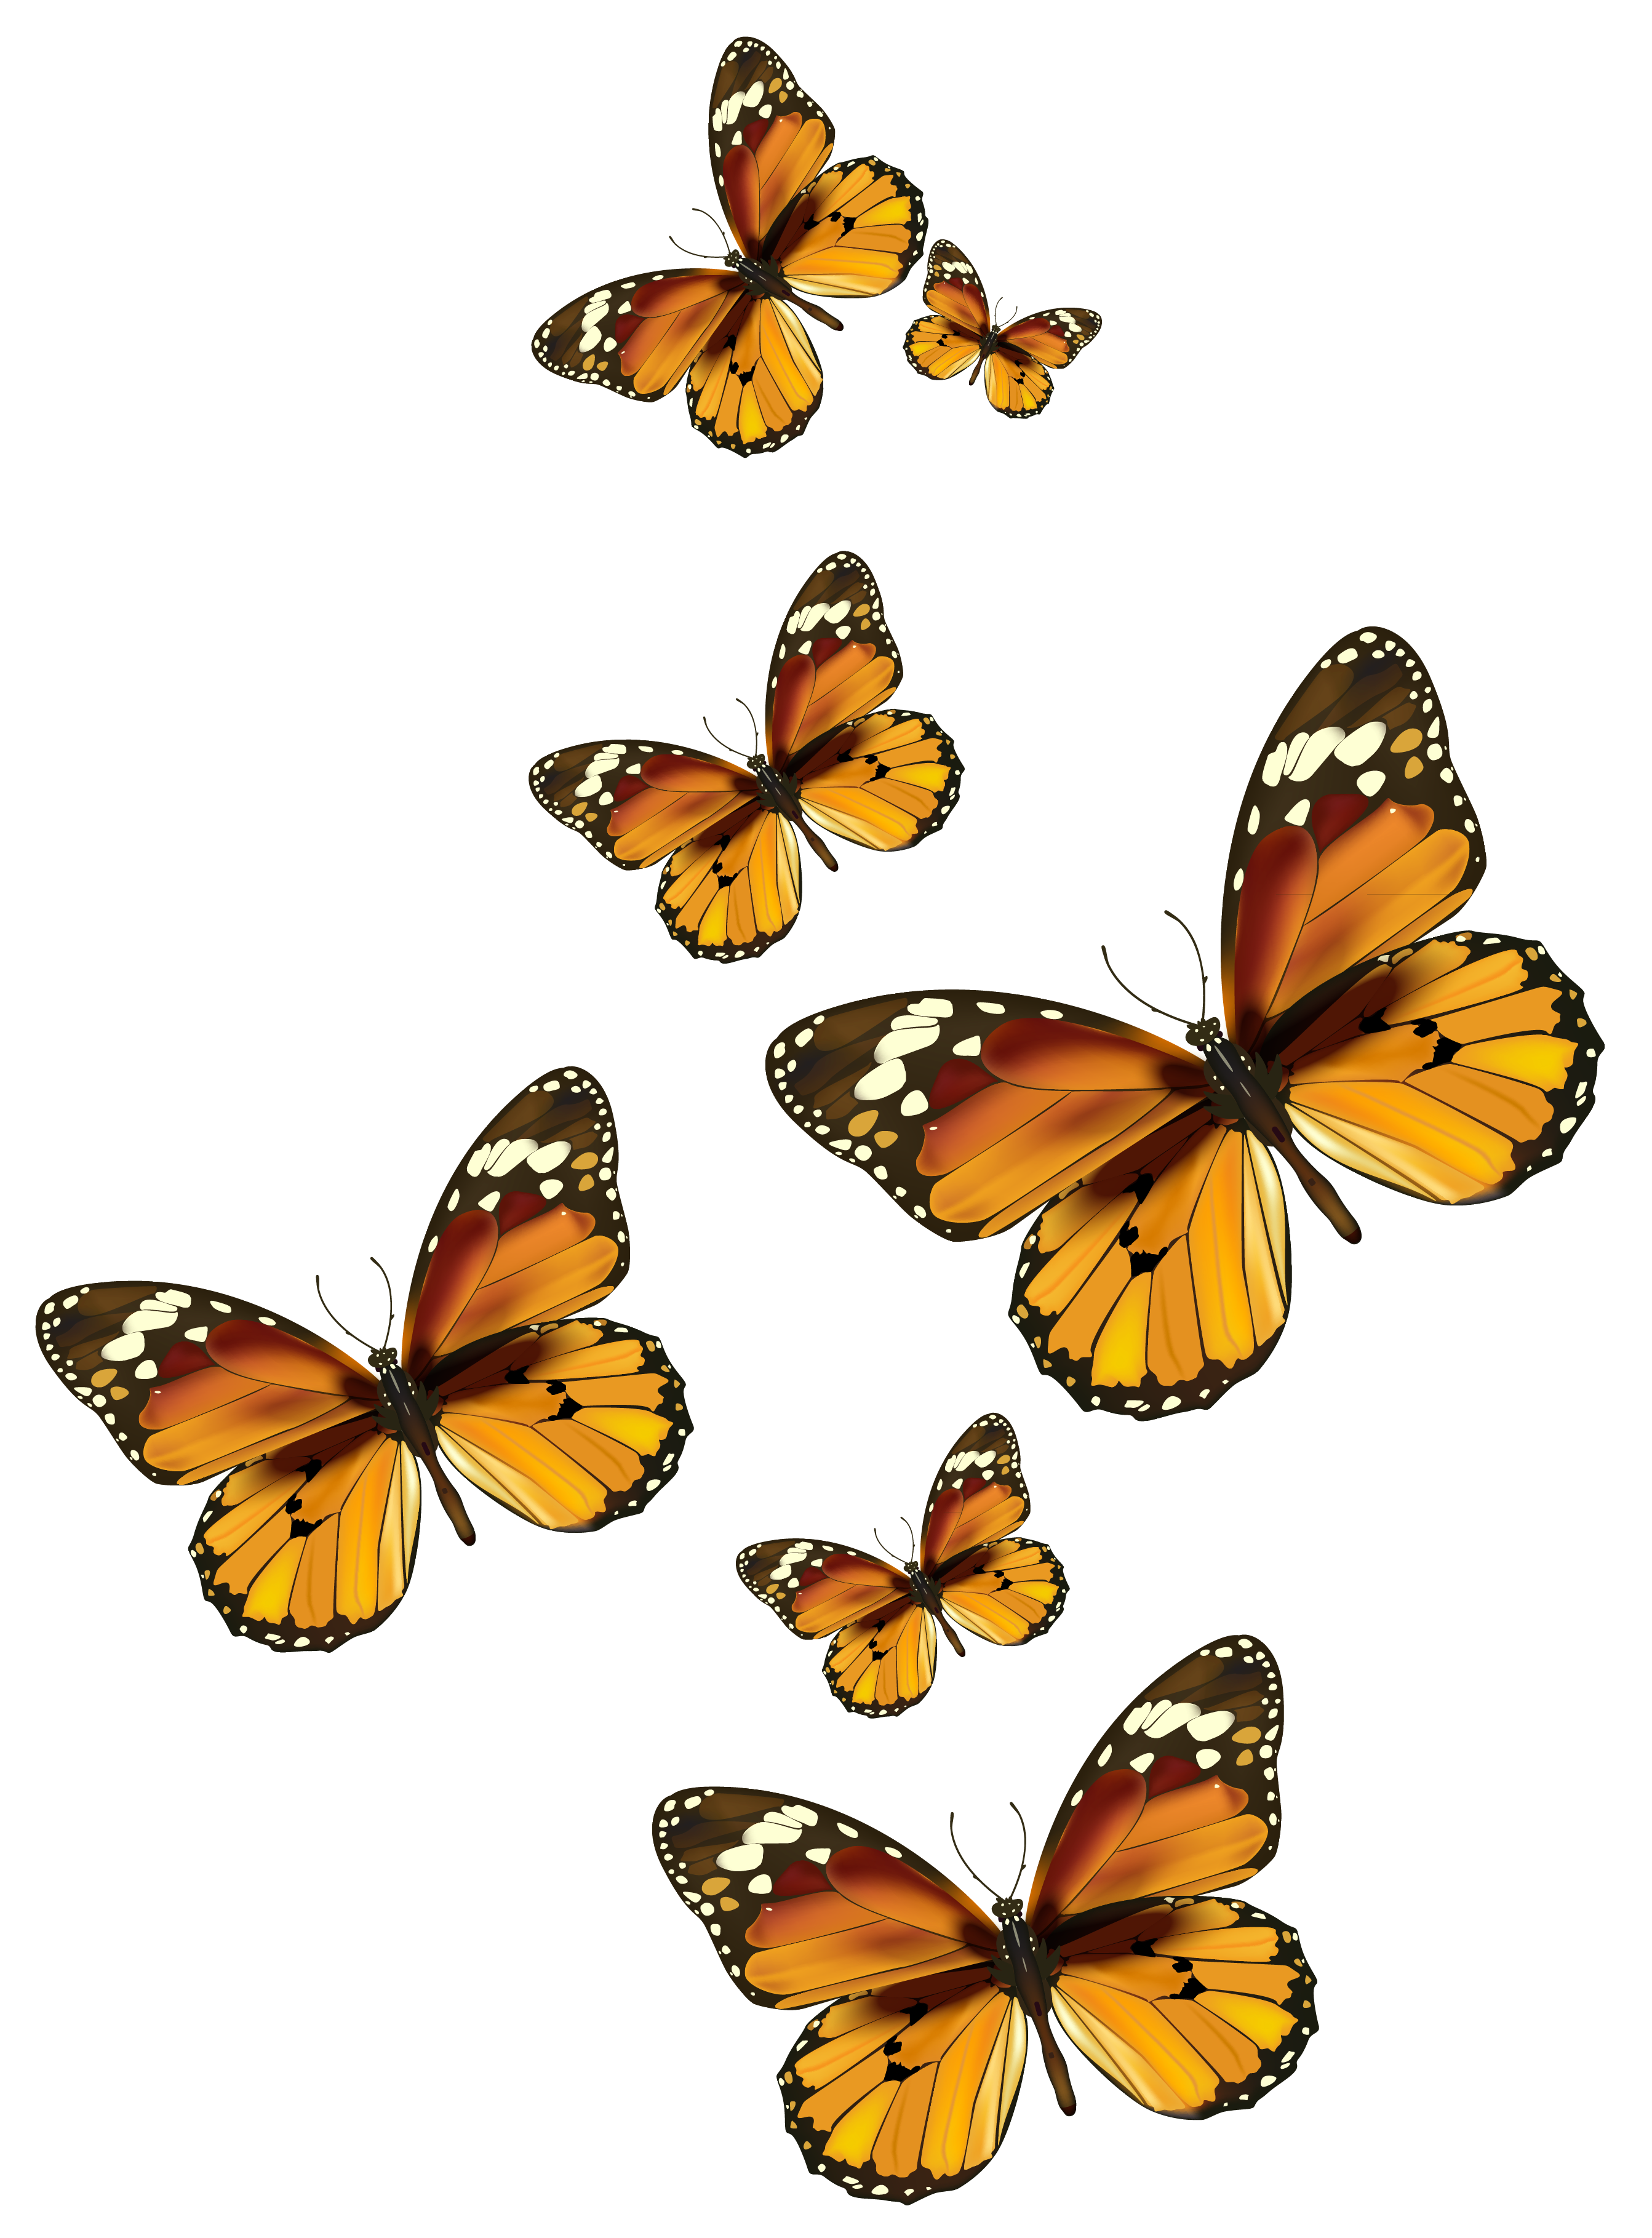 Butterflies Vector Png Clipart Picture Butterfly Clip Art Butterflies Vector Cartoon Butterfly